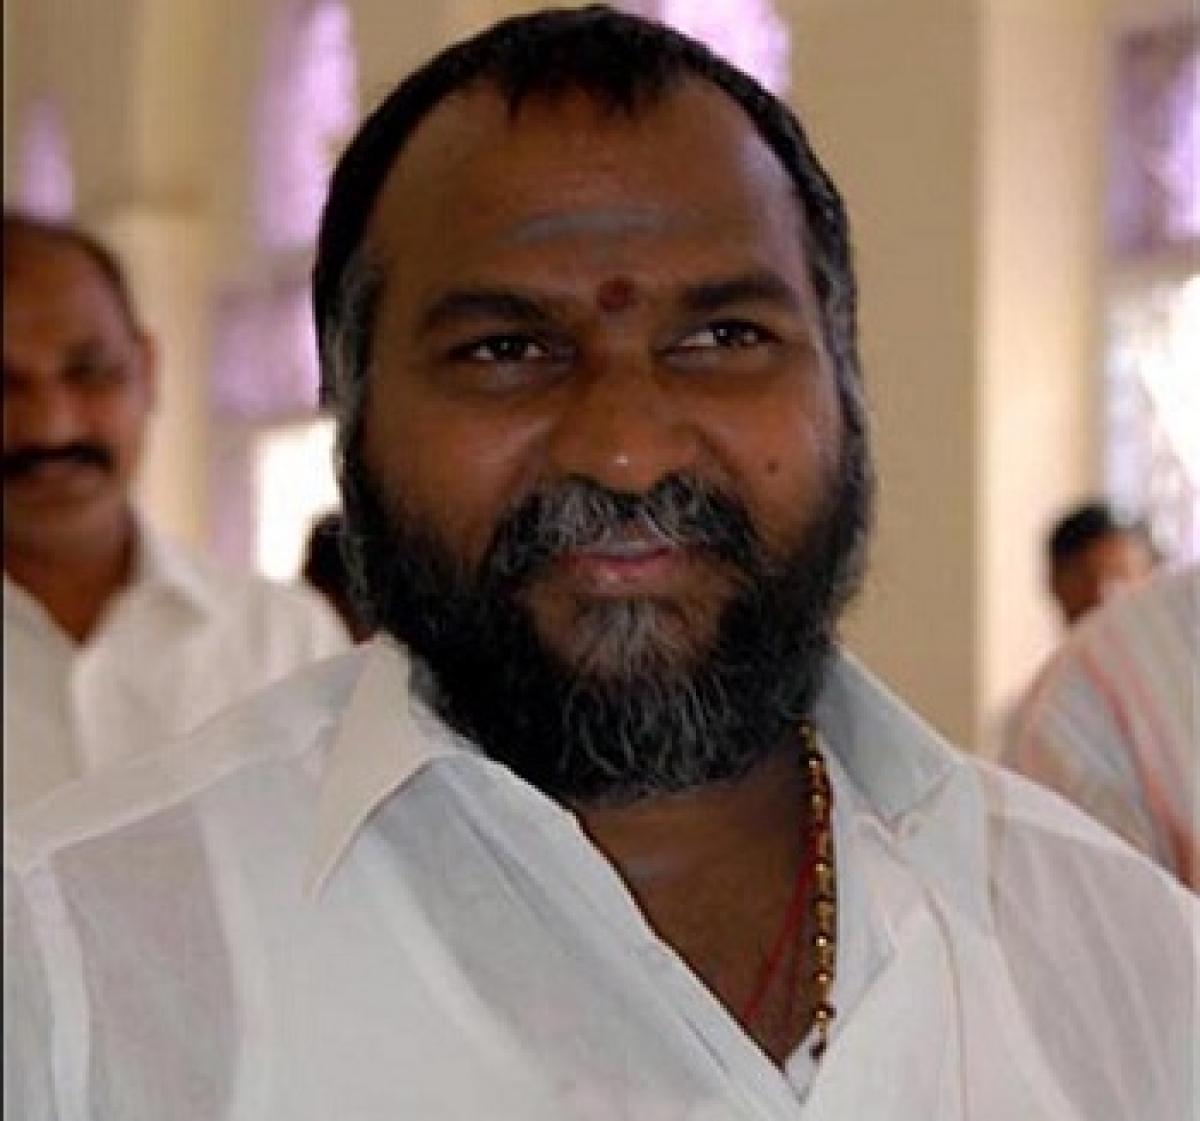 Congress leader Jagga Reddy arrested in Sangareddy